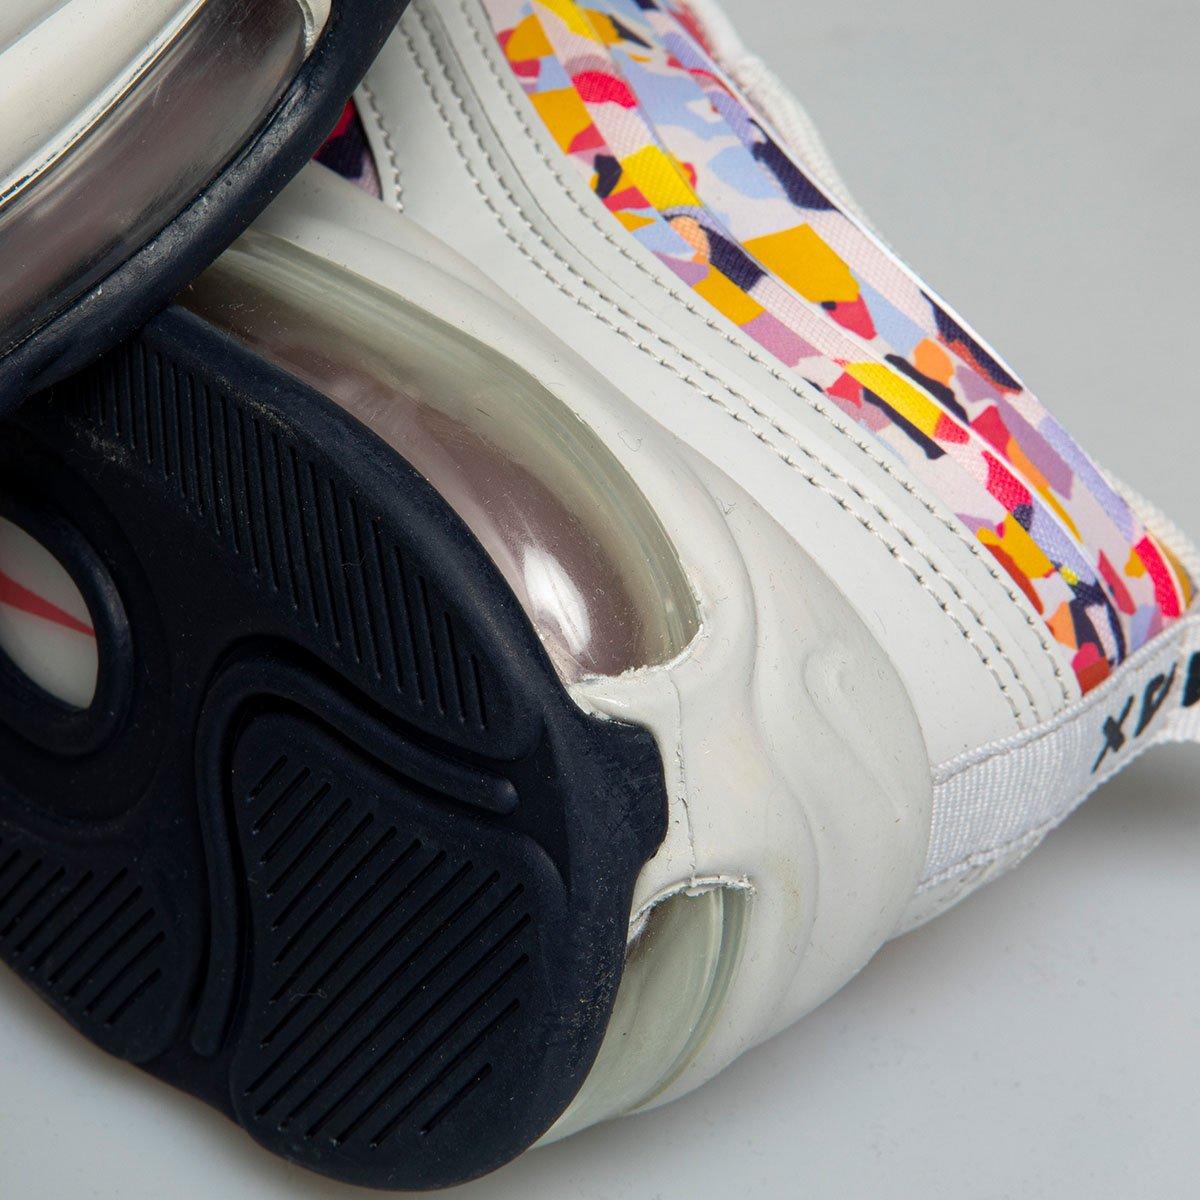 Nike Air Max 97 Bio Beige AR7621 201 Release Date SBD